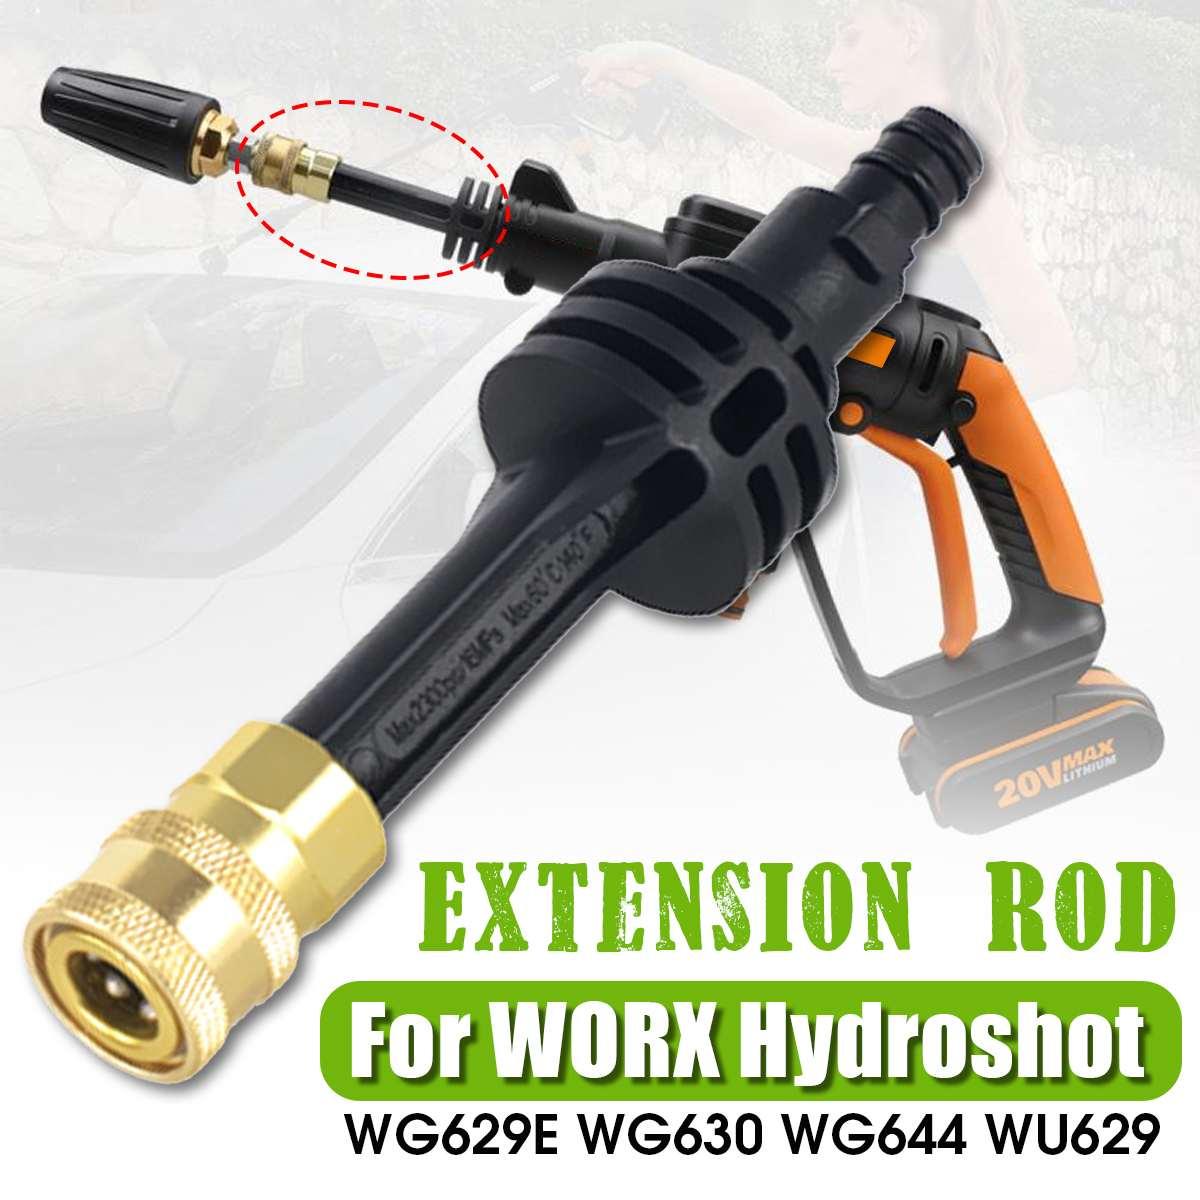 Original Extension Shot Rod Adapter For WORX Hydroshot WG629E WG630 WG644 WU629